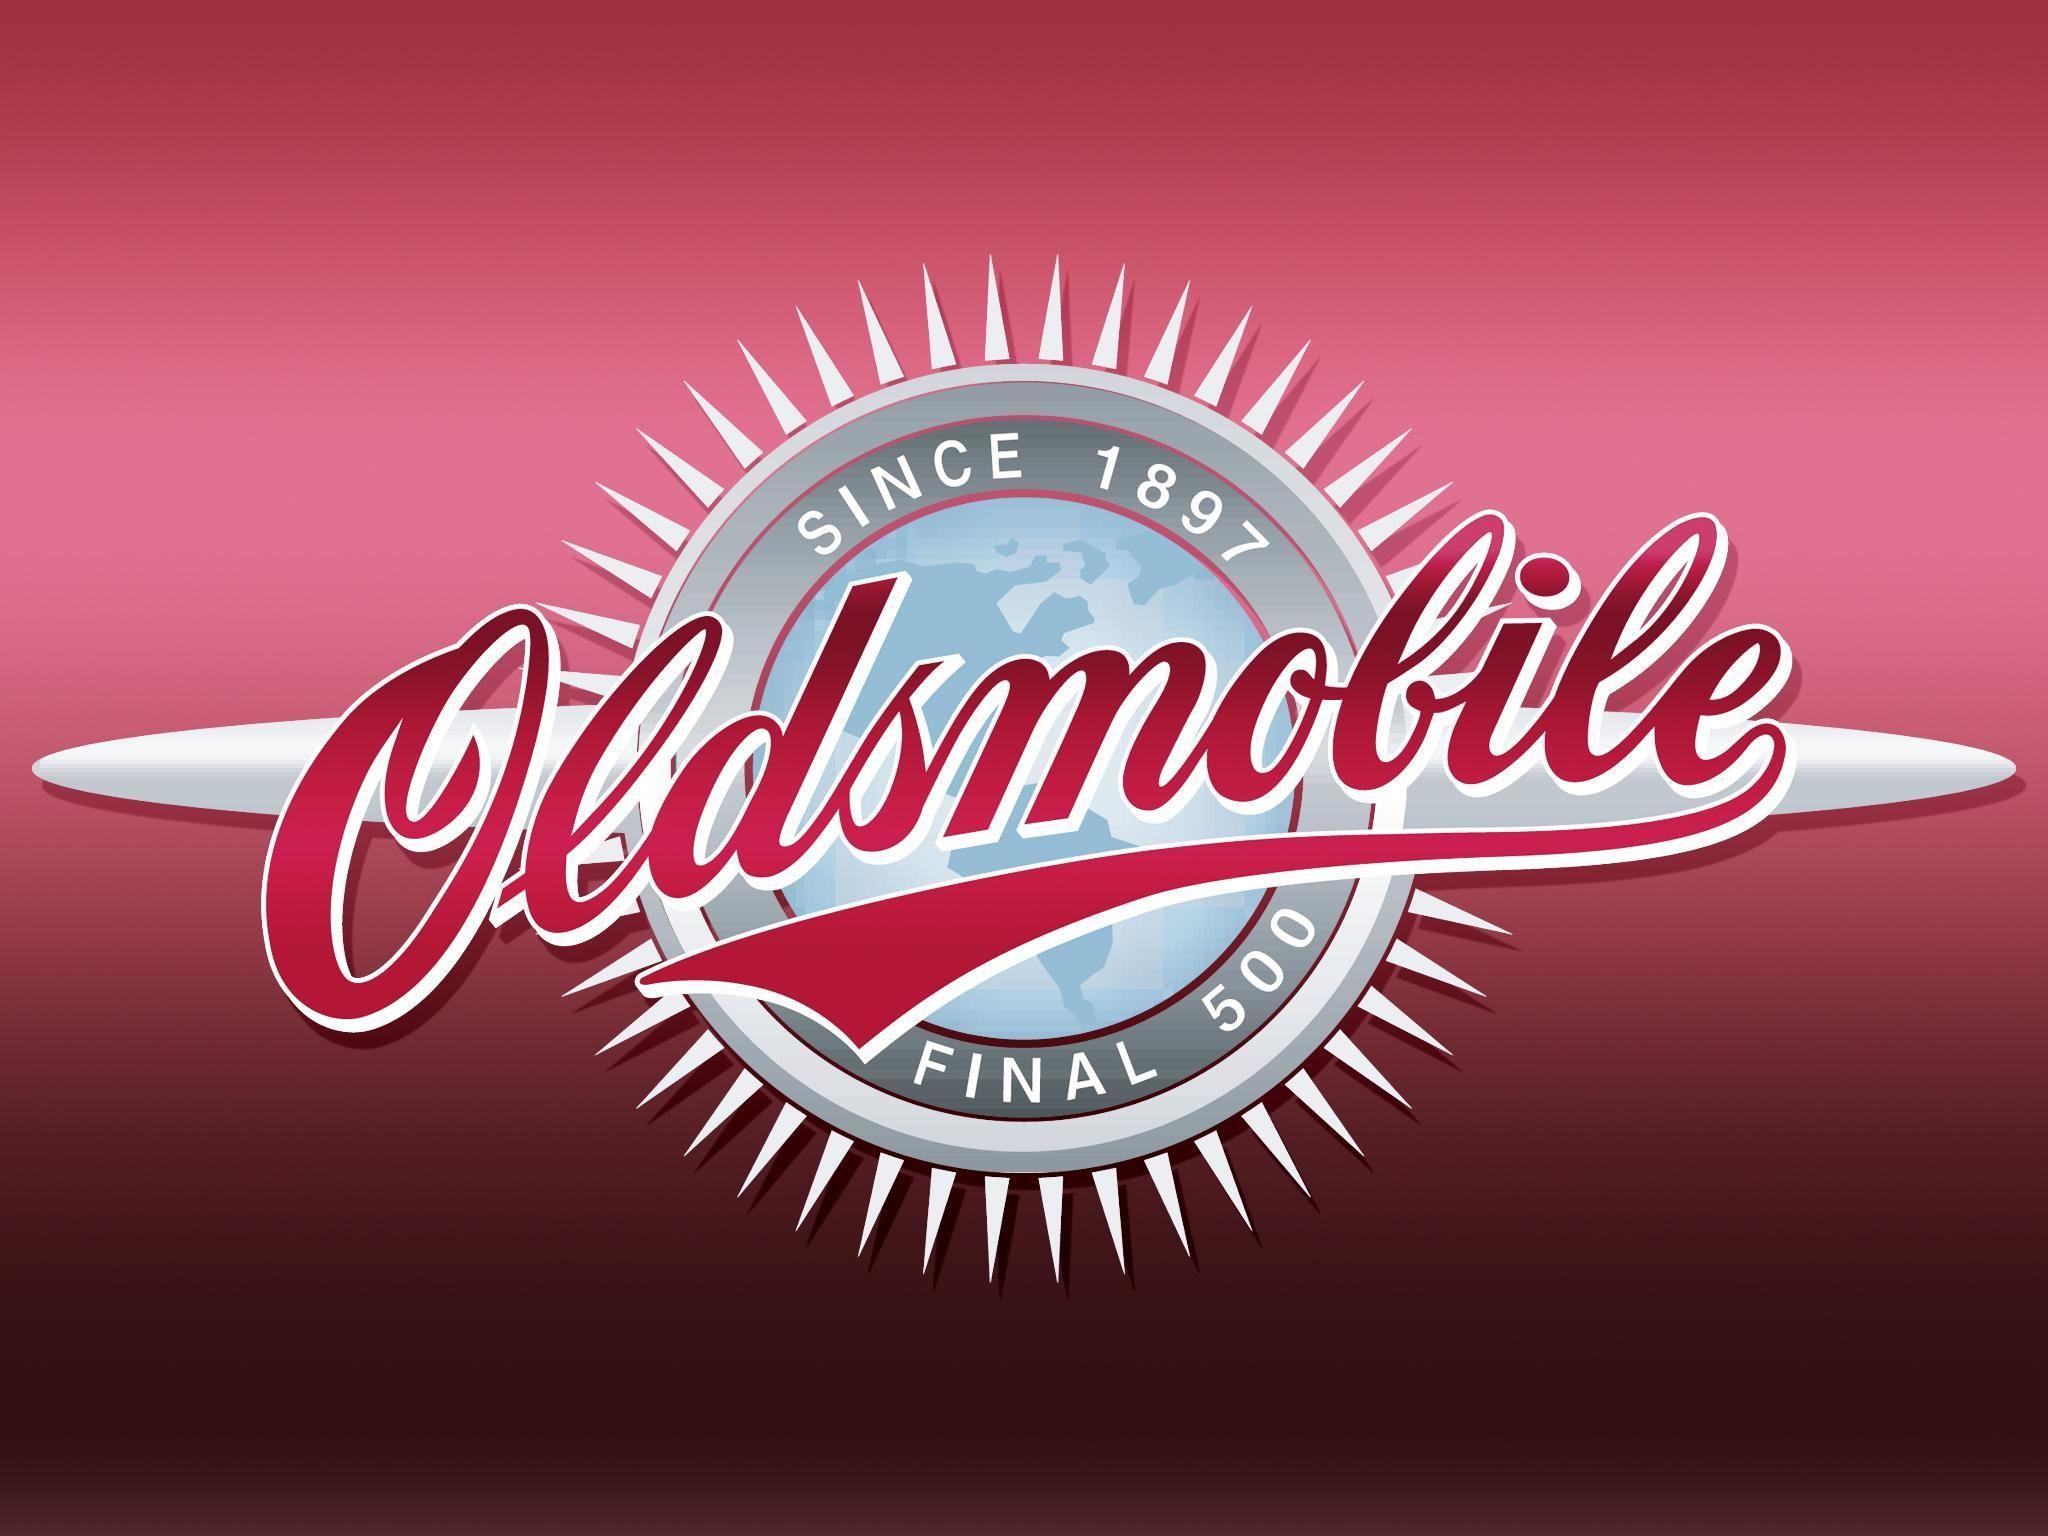 Oldsmobile logo download in hd quality download oldsmobile logo voltagebd Image collections